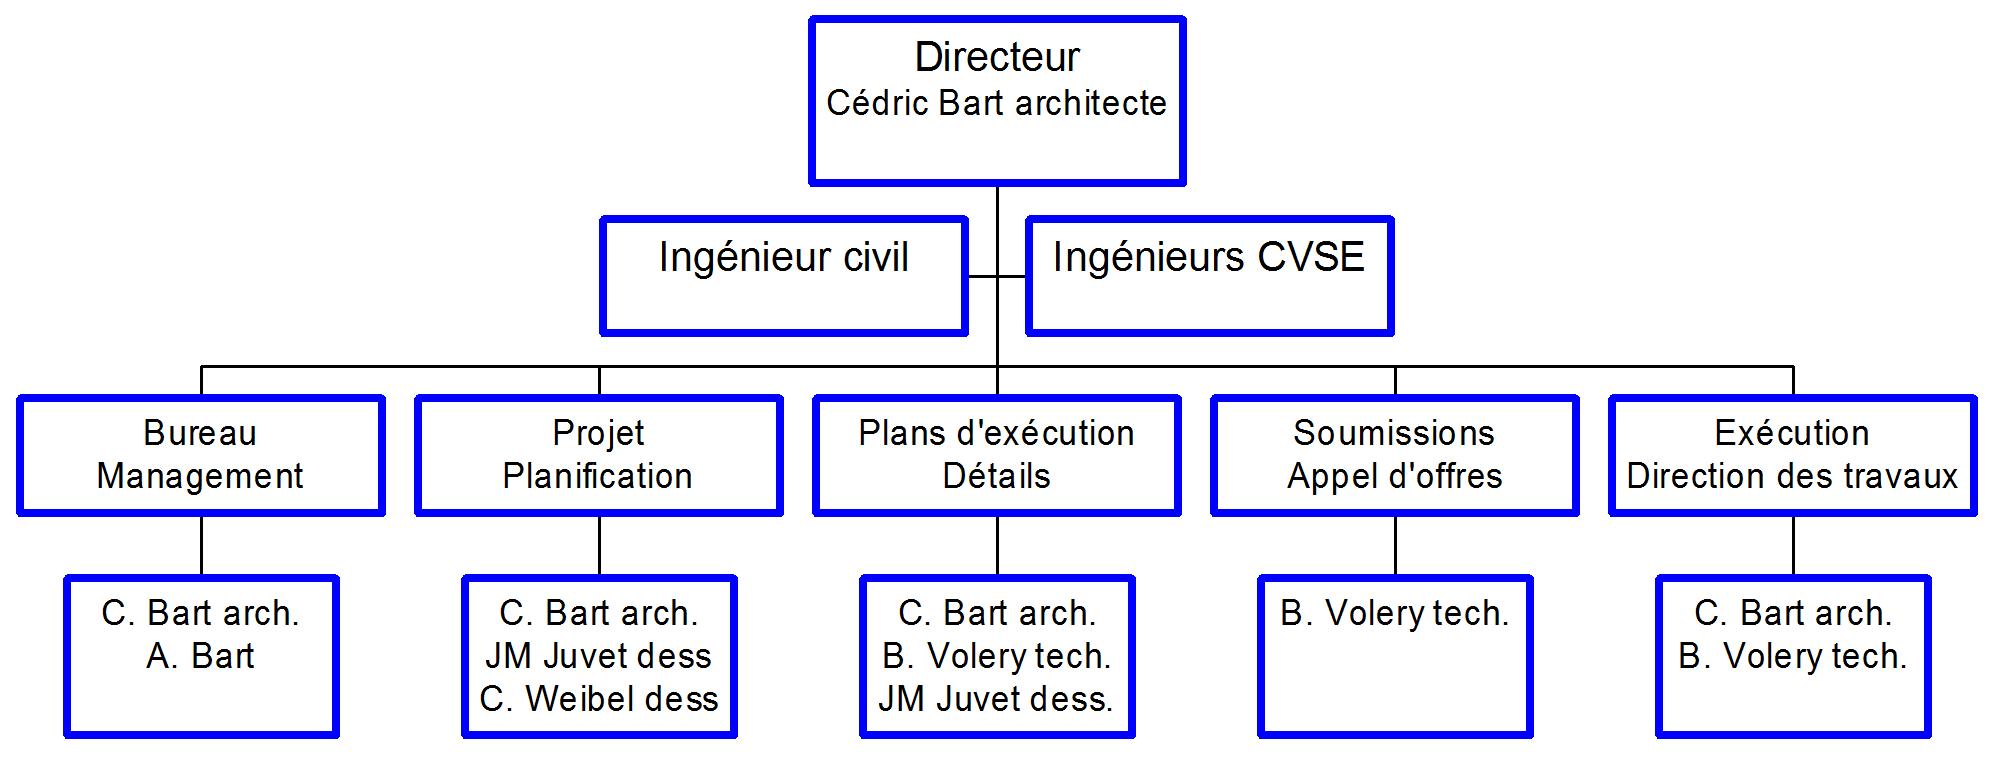 Organigramme Architecte Bart